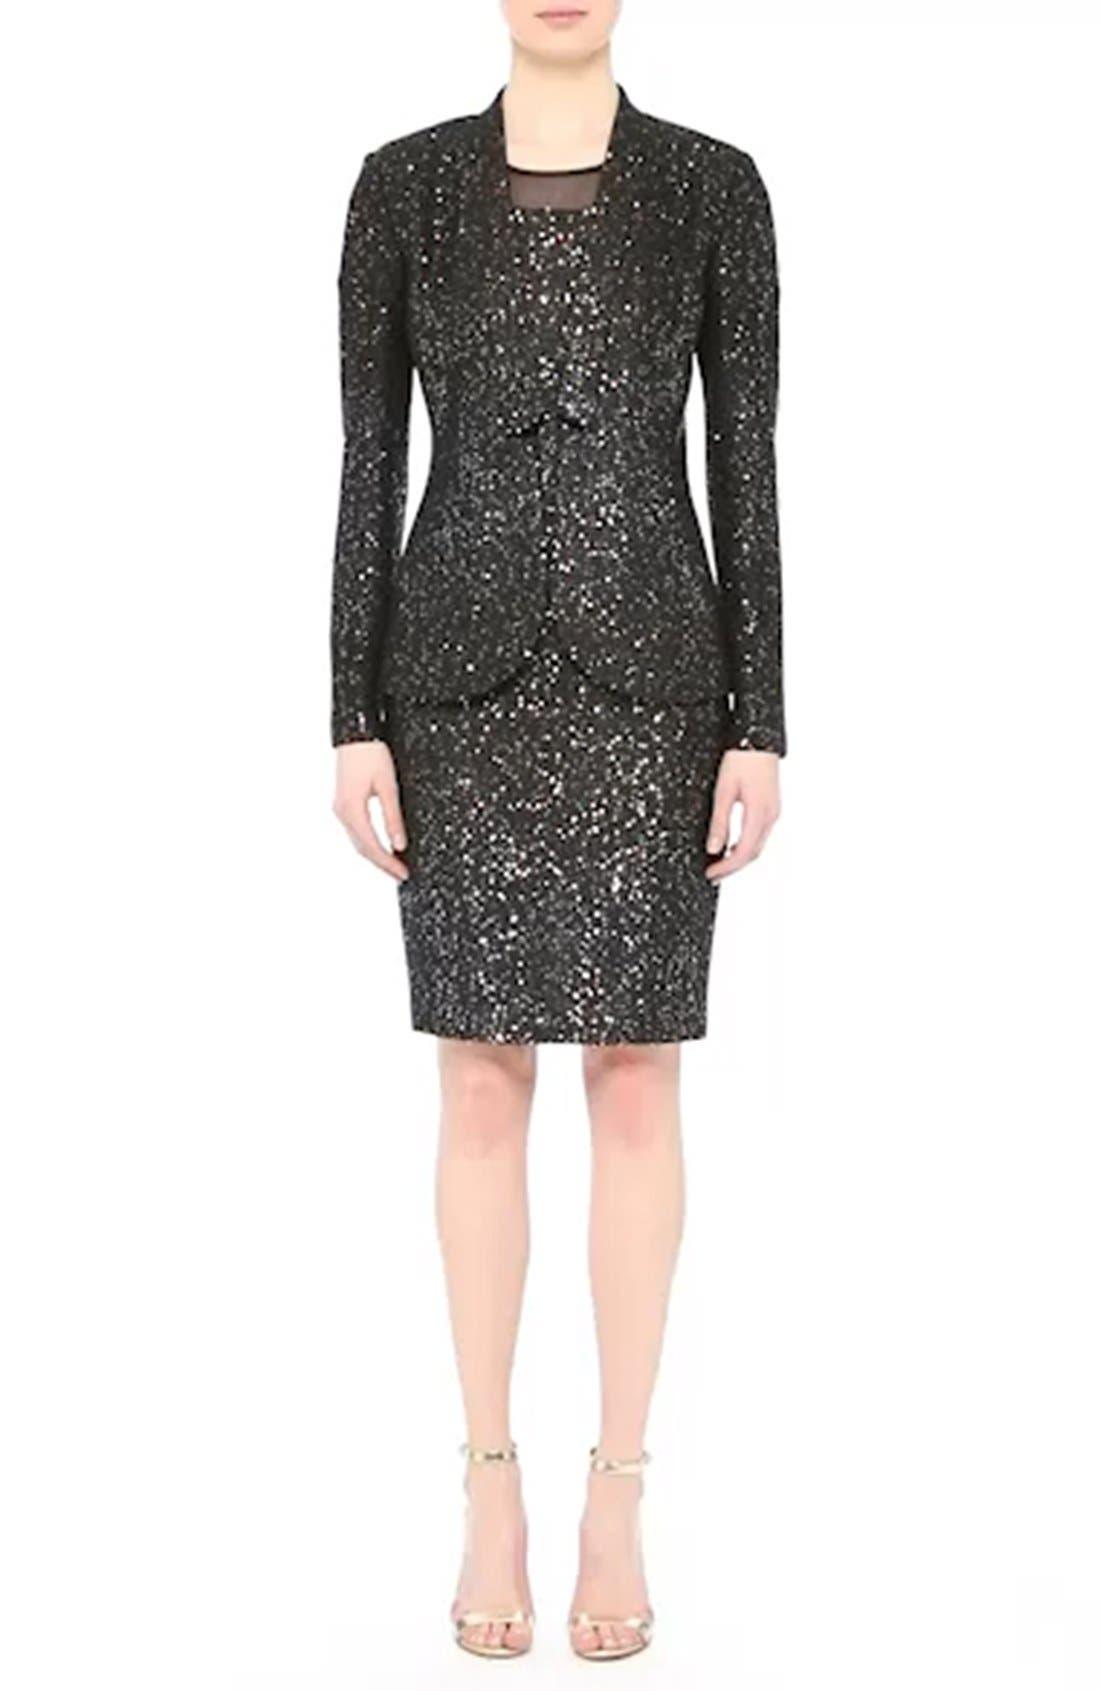 Pranay Sequin Knit Sheath Dress,                             Alternate thumbnail 8, color,                             001